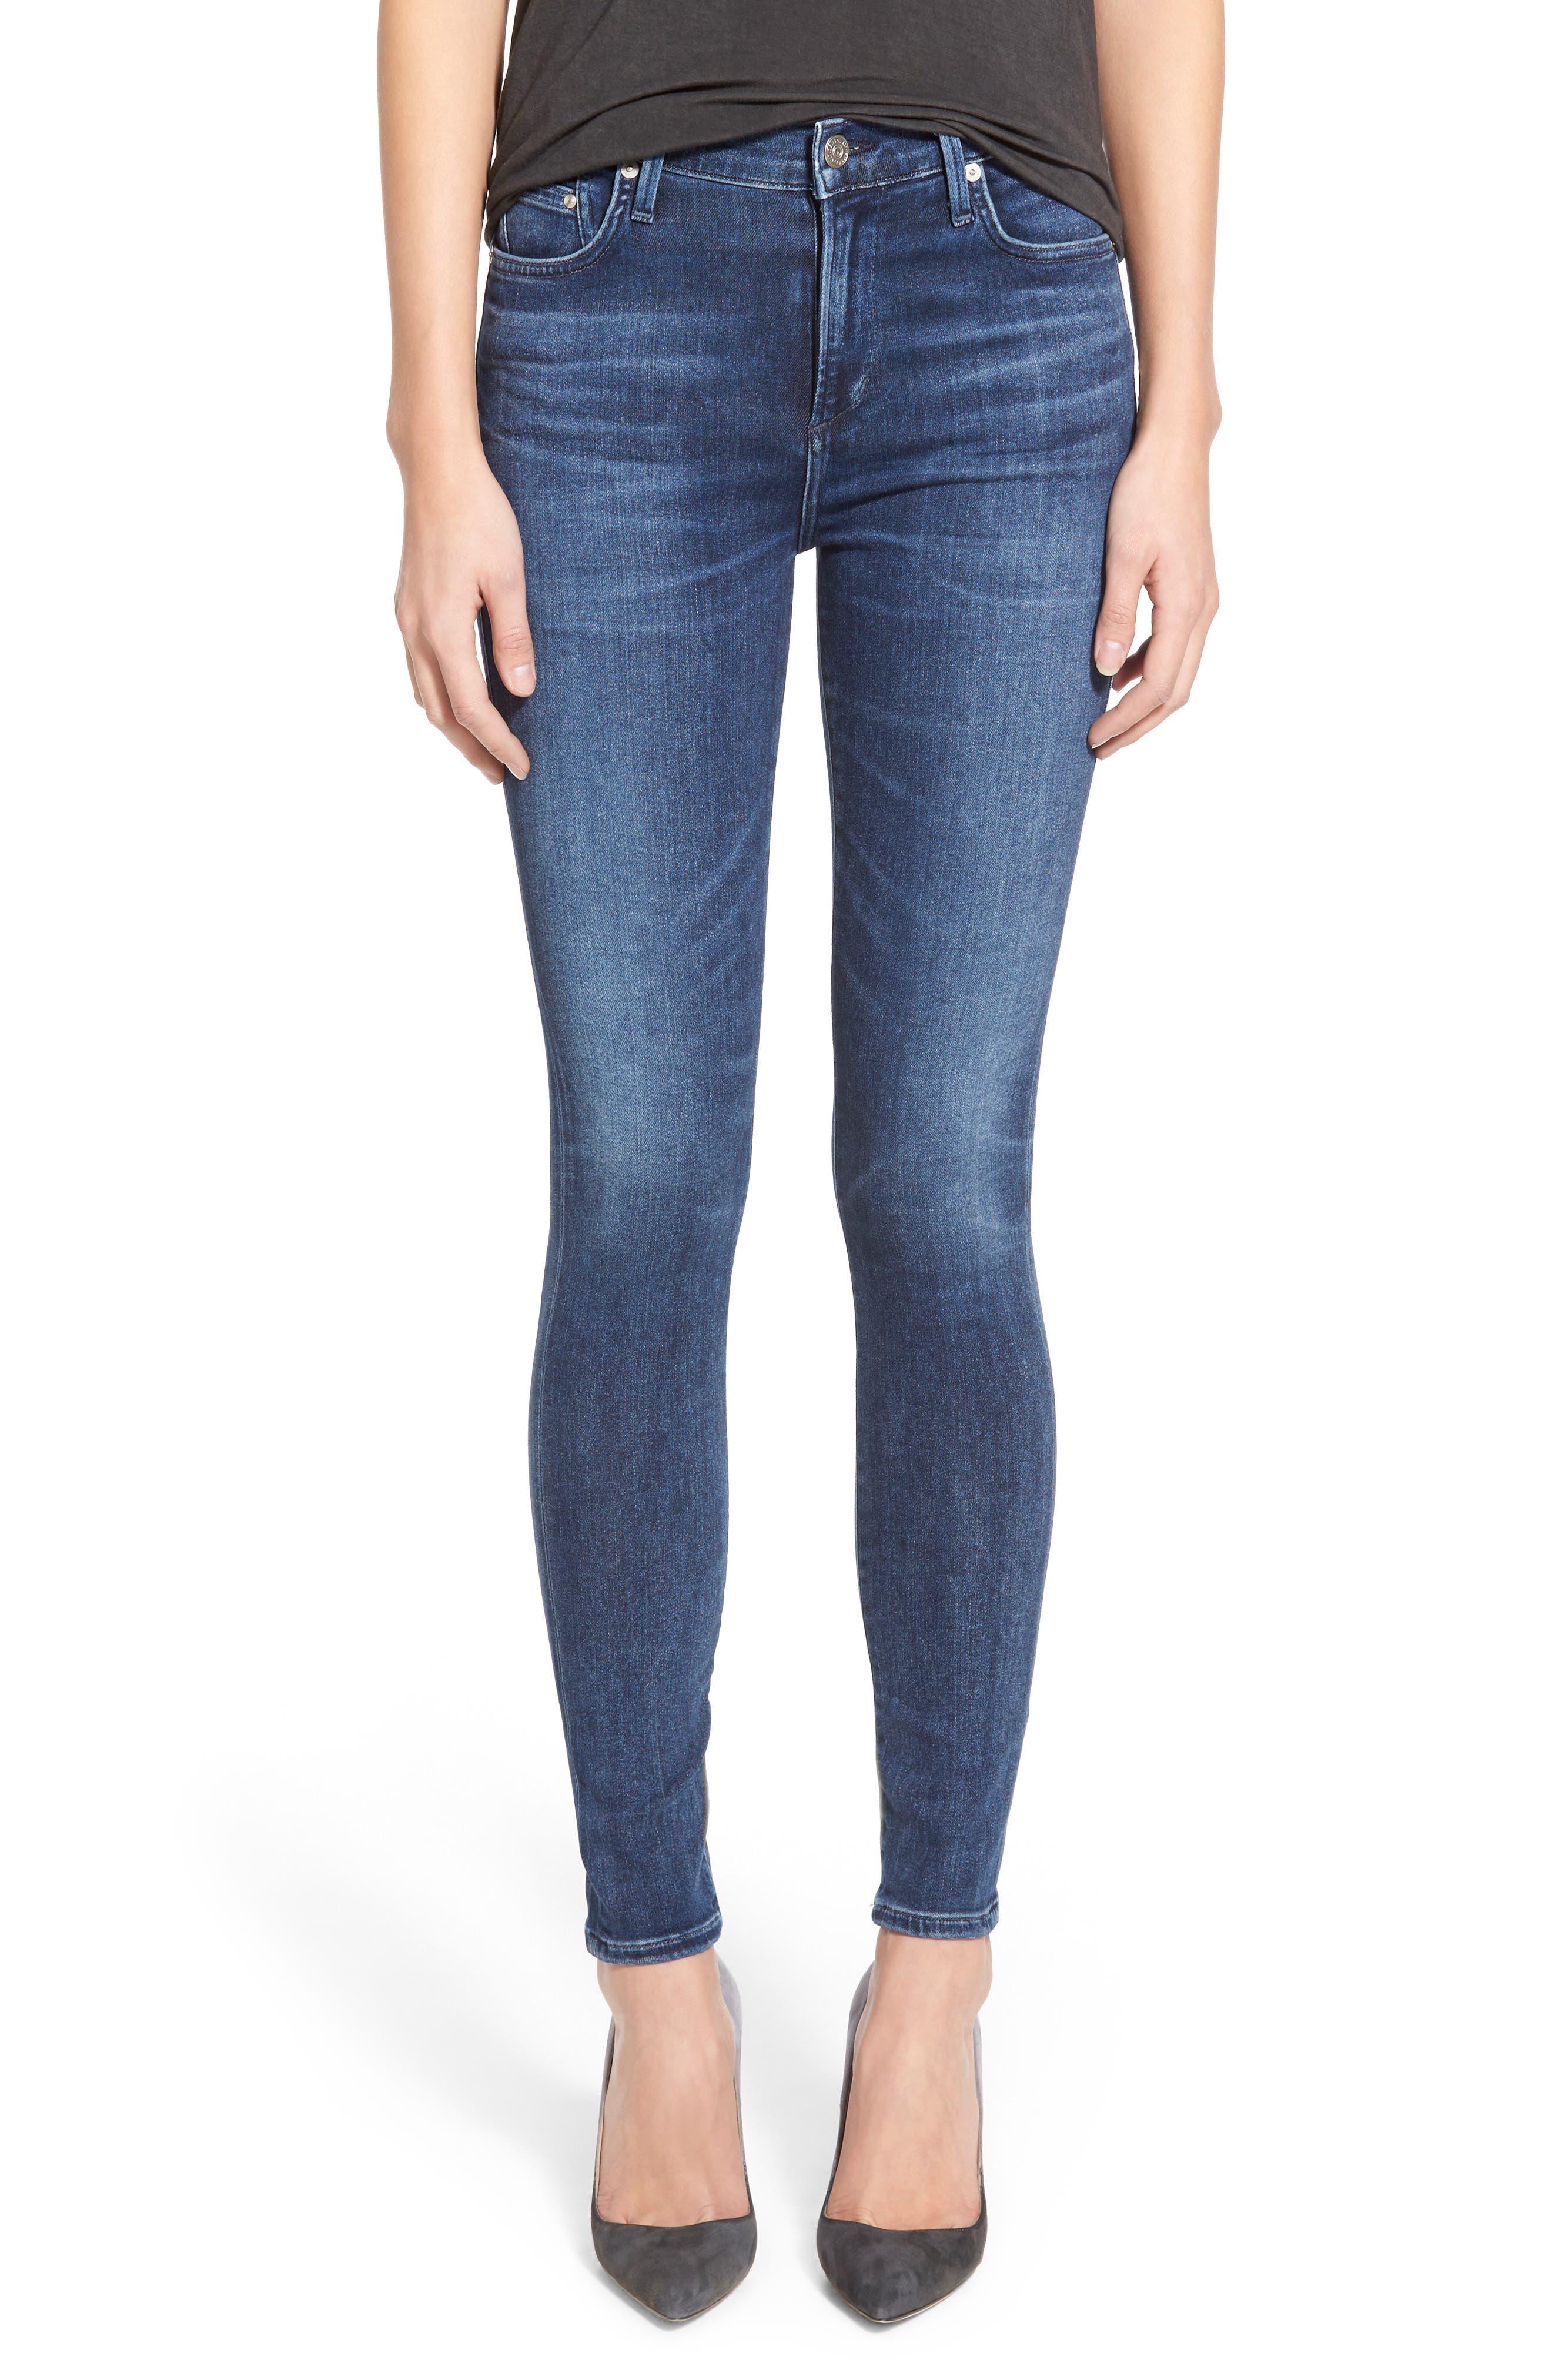 Sculpt - Rocket High Waist Skinny Jeans,                             Main thumbnail 1, color,                             WAVERLY